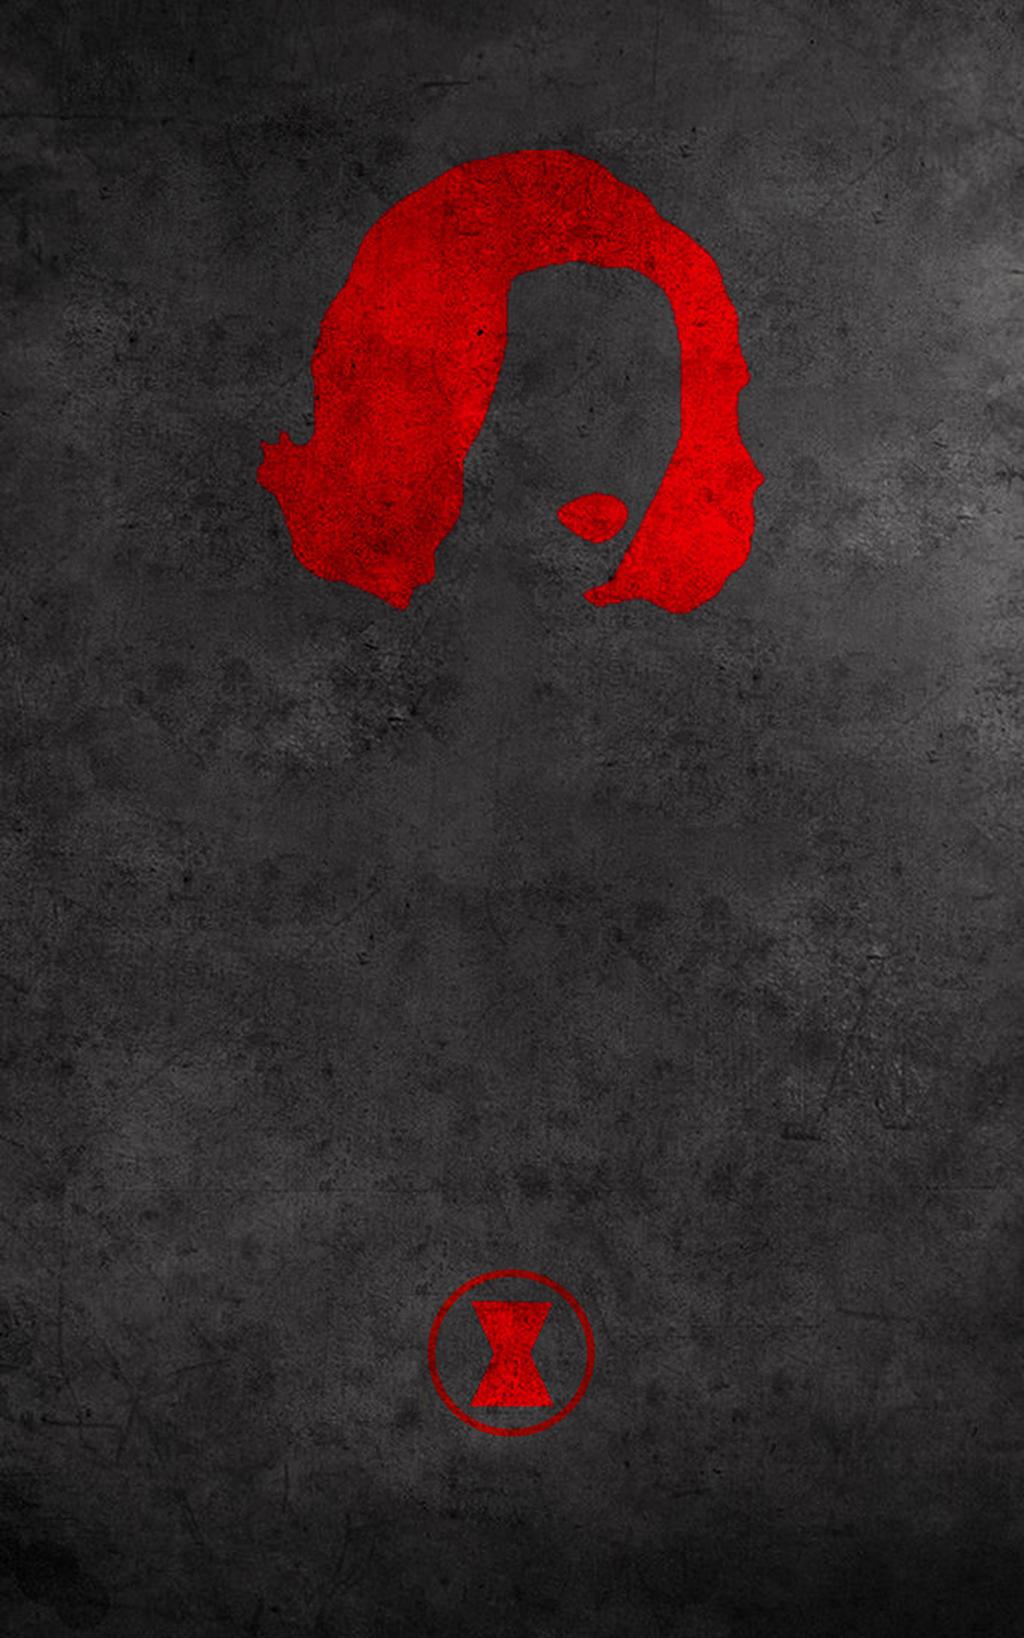 Black Widow Minimalist by Alyrah-Sabre on DeviantArt